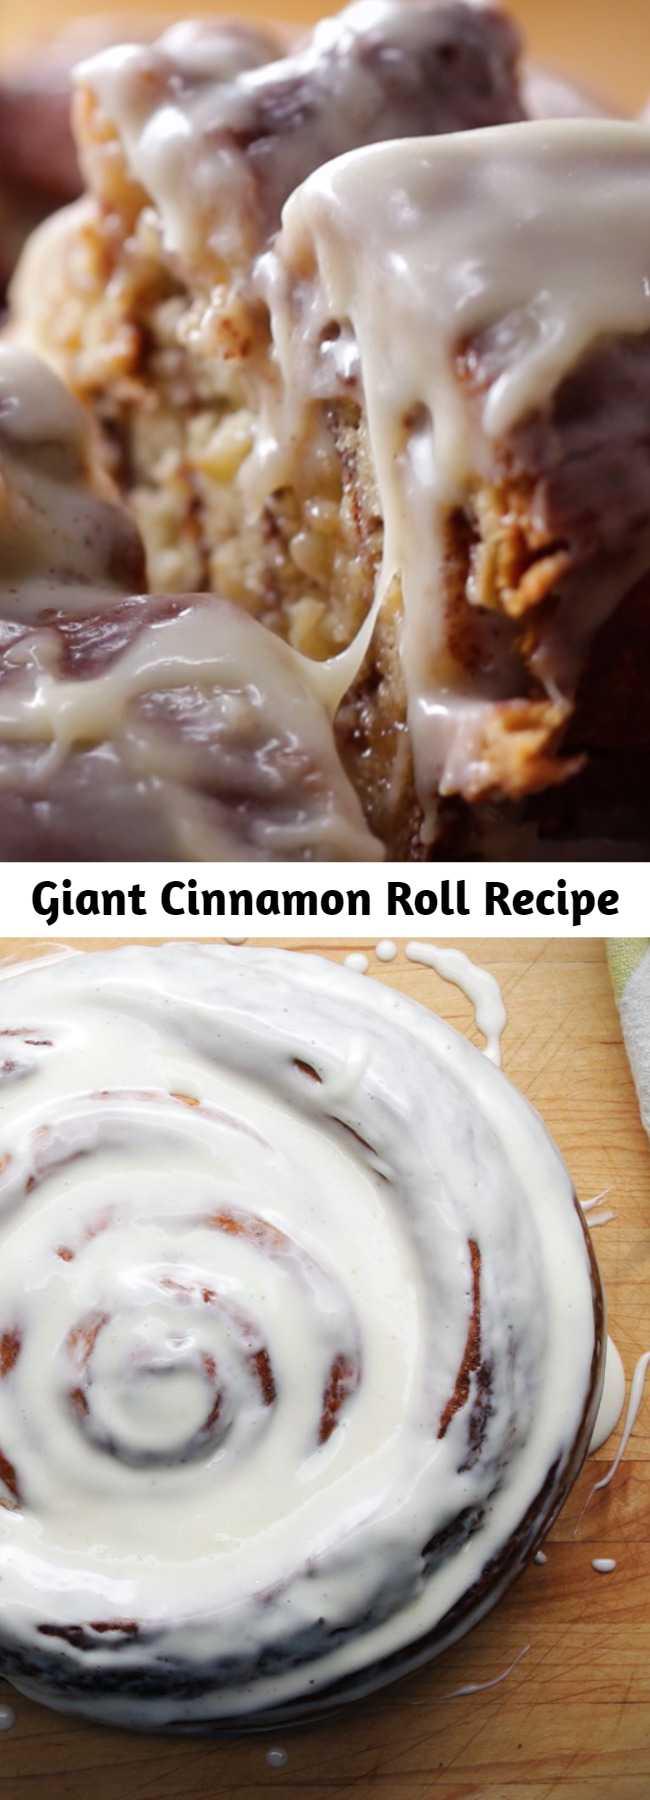 Giant Cinnamon Roll Recipe